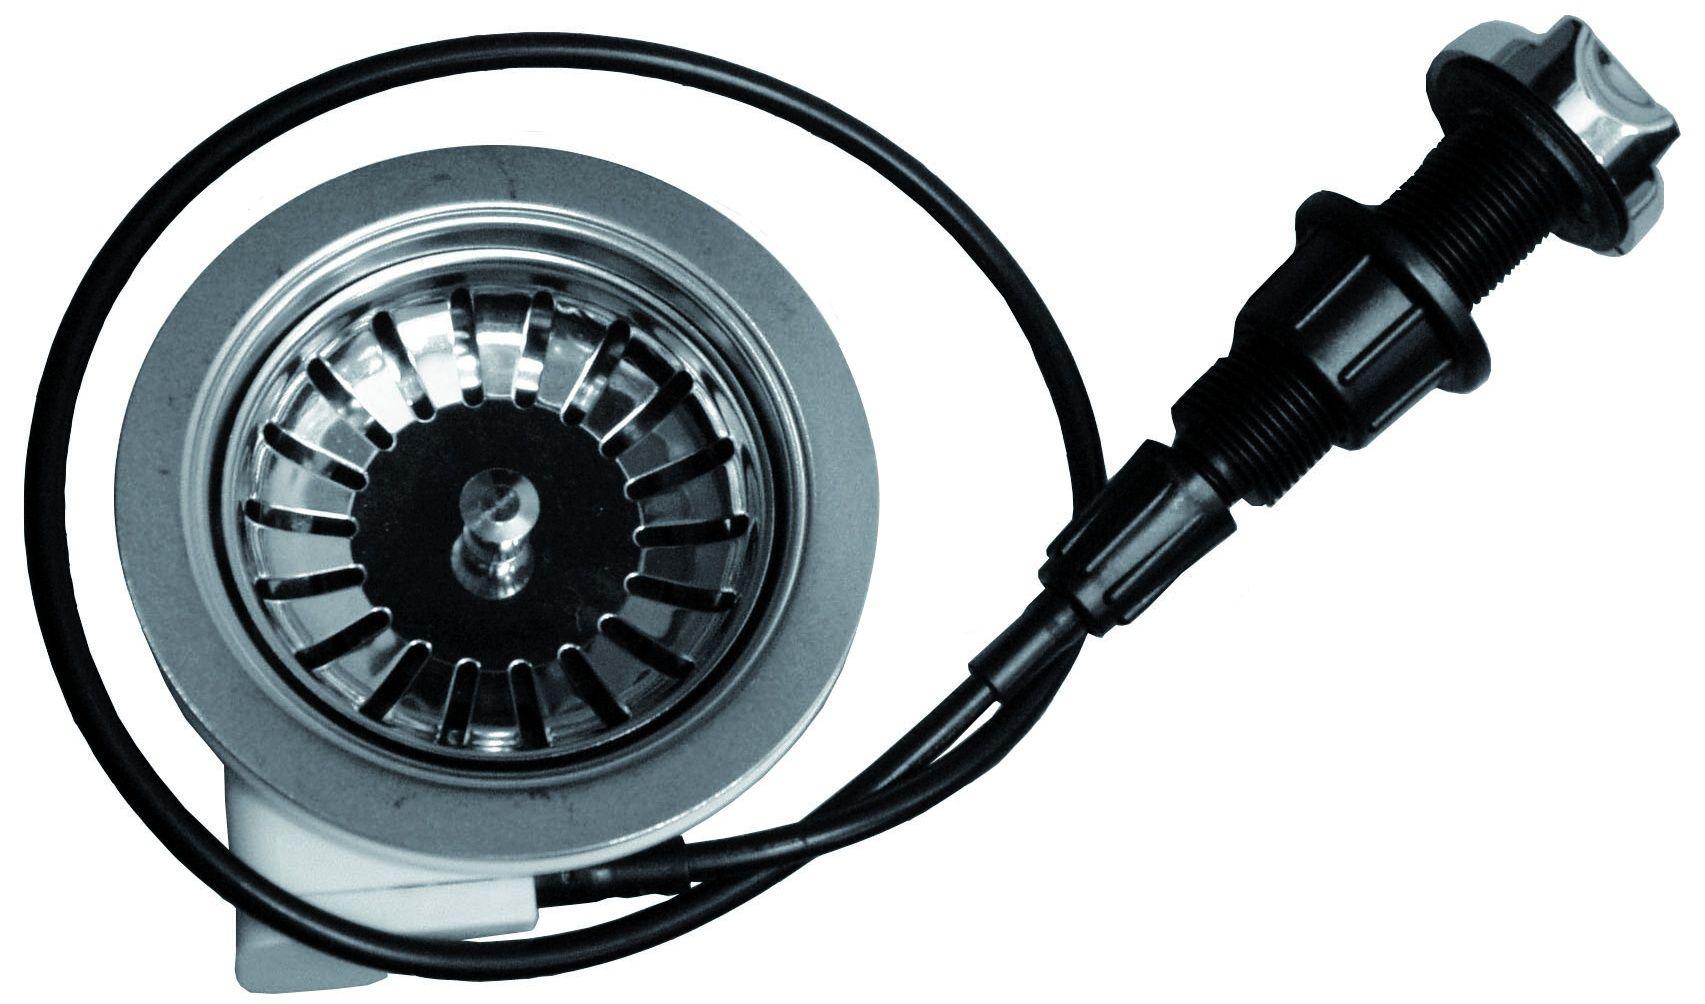 "Otočný sítkový ventil 3 1/2"" Franke 112.0304.621, chrom, kulatý knoflík, pro dřez MON 651 E"